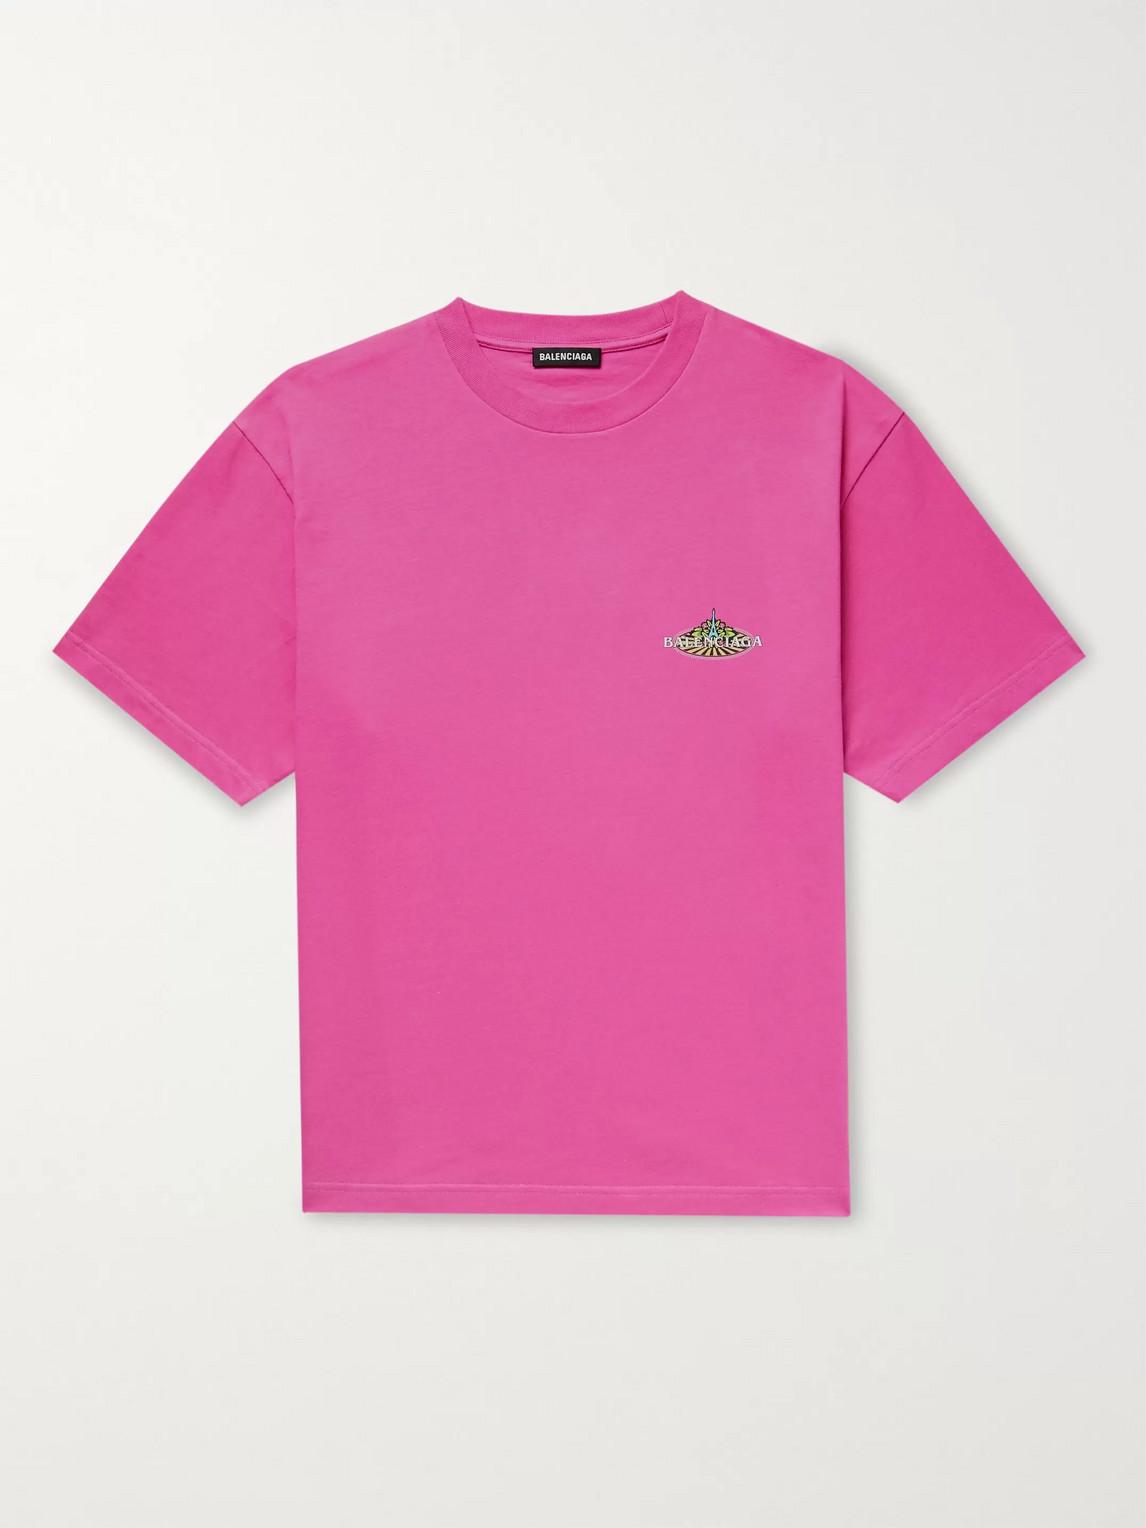 balenciaga - bonjour paris logo-print cotton-jersey t-shirt - men - pink